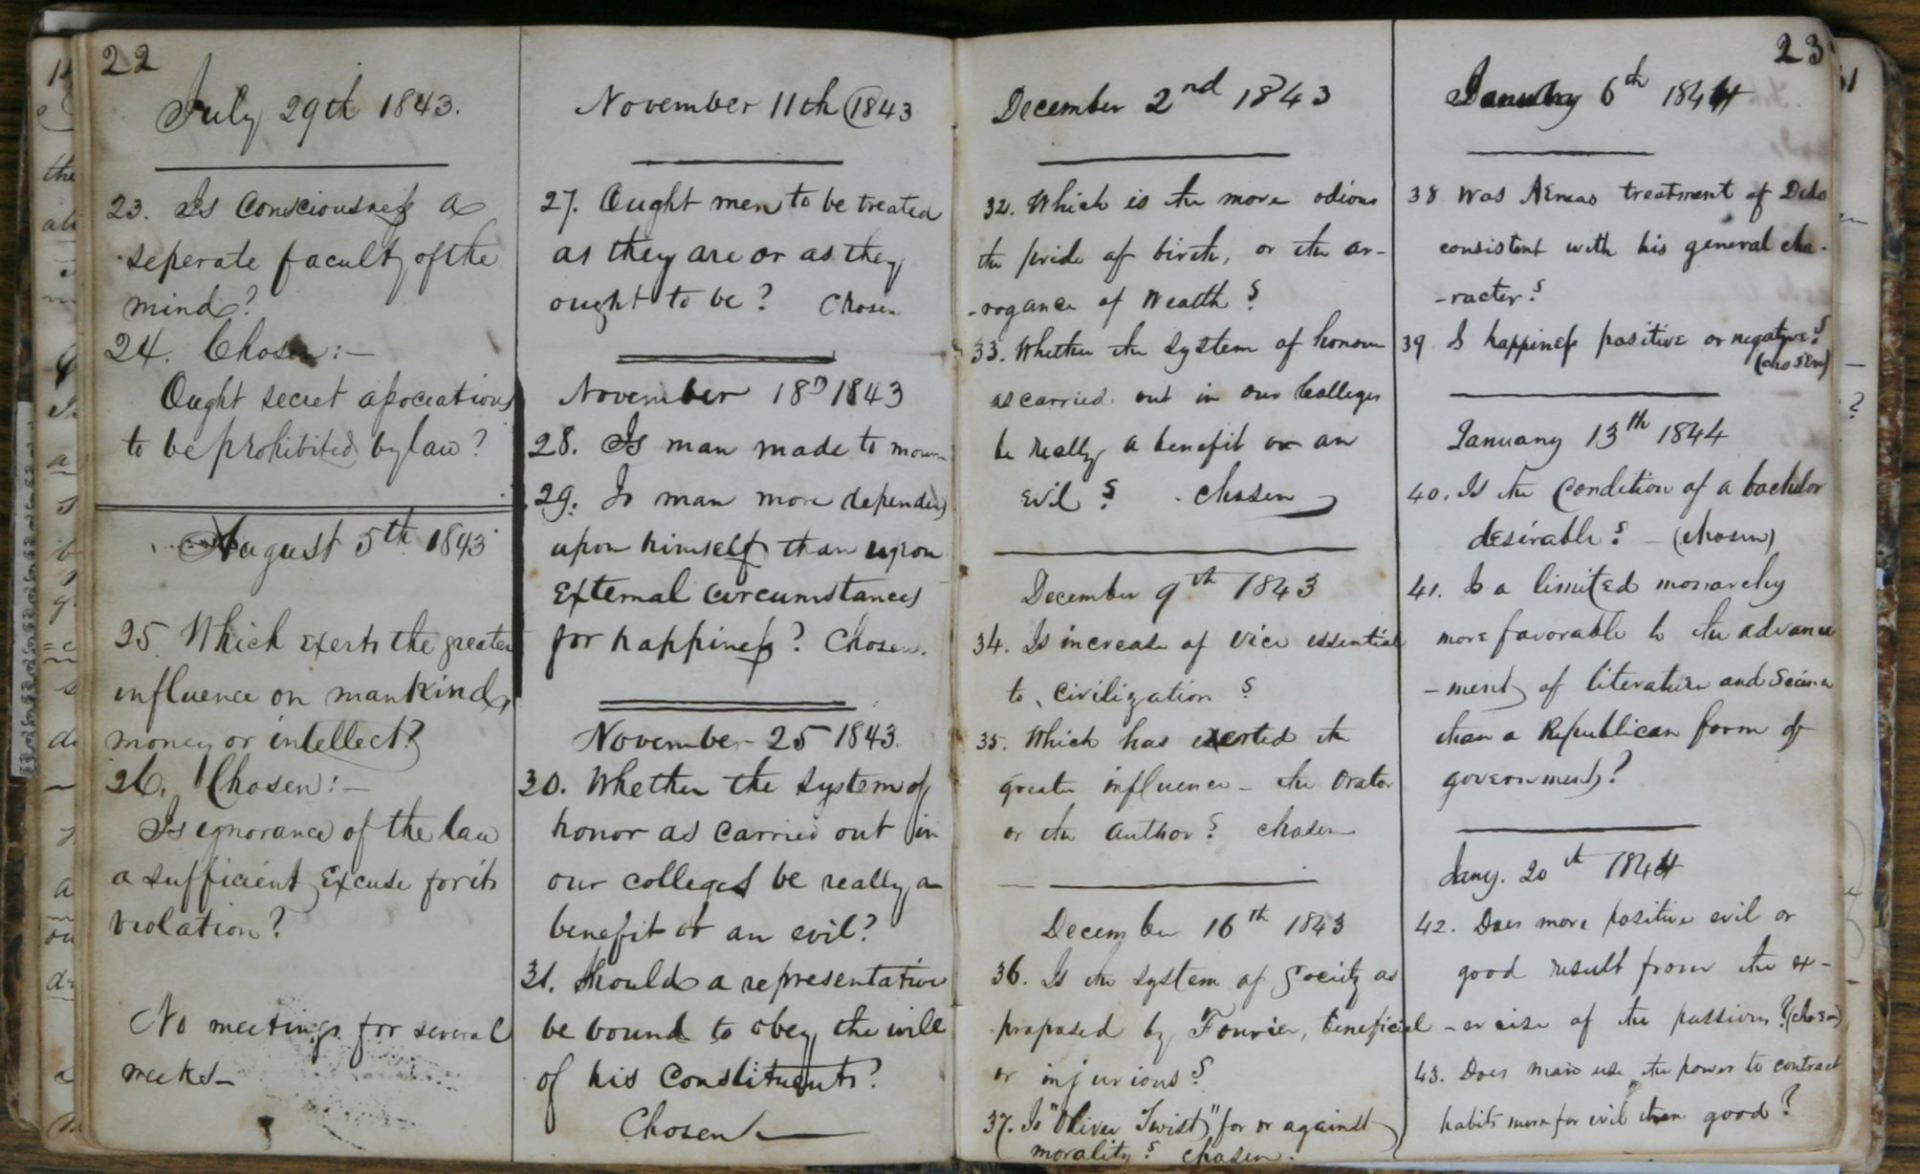 Athenaen Literary Society debating questions book - 1837 -1848